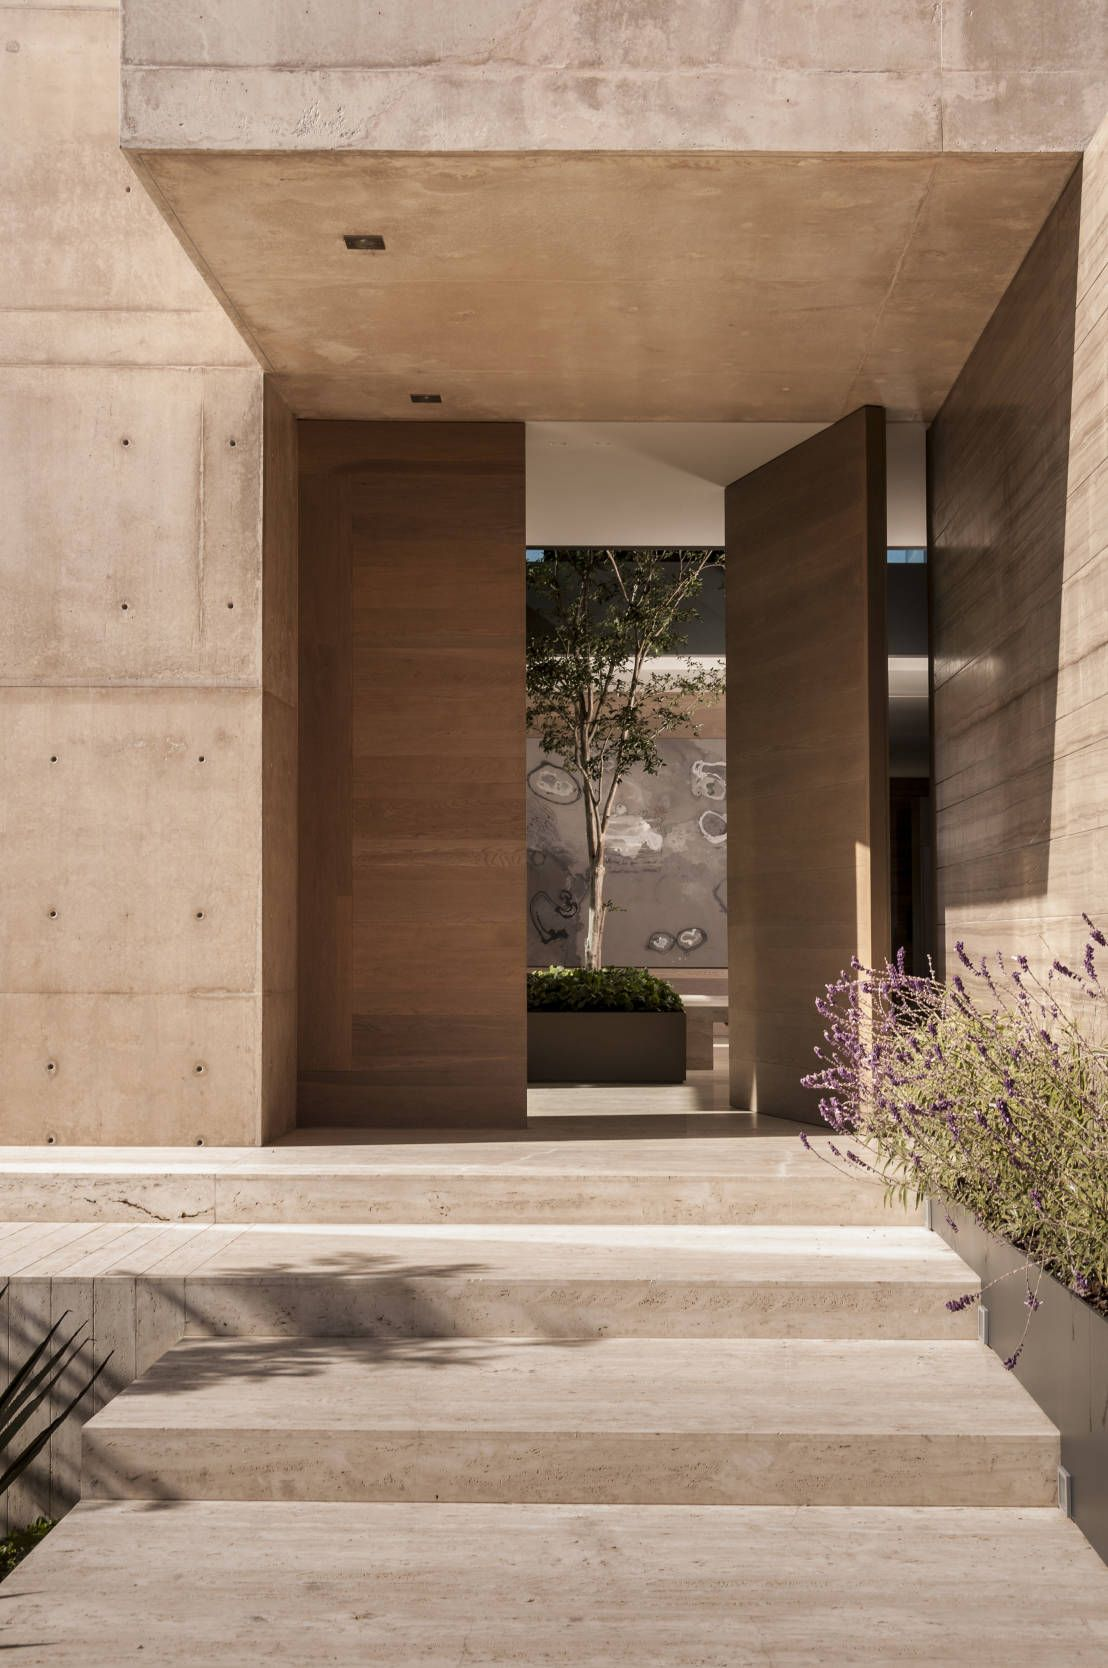 Casa ml puertas y ventanas modernas de gantous for Puertas vaiven modernas